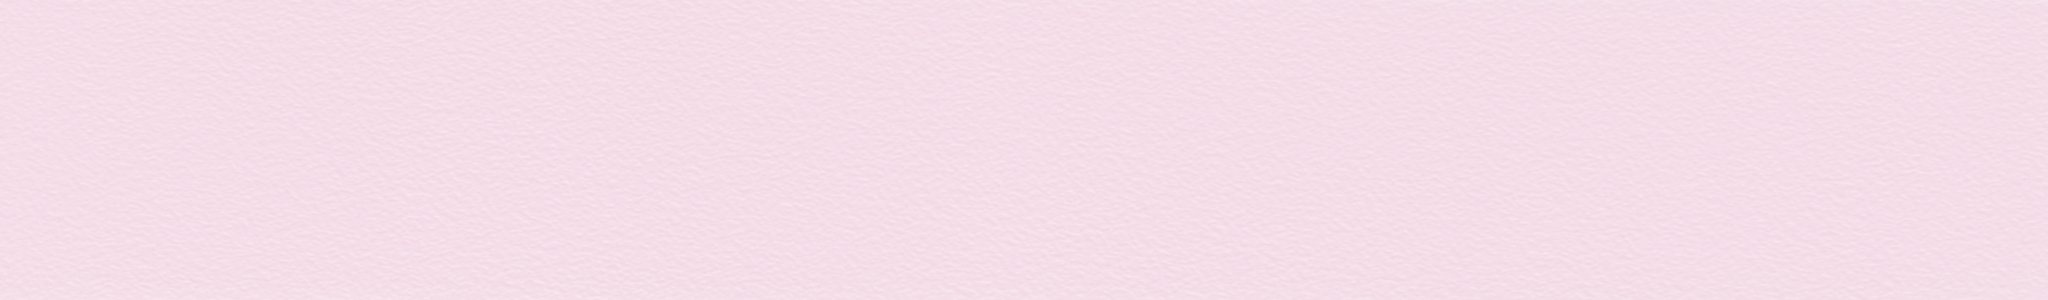 HU 13336 ABS Edge Pink Pearl XG